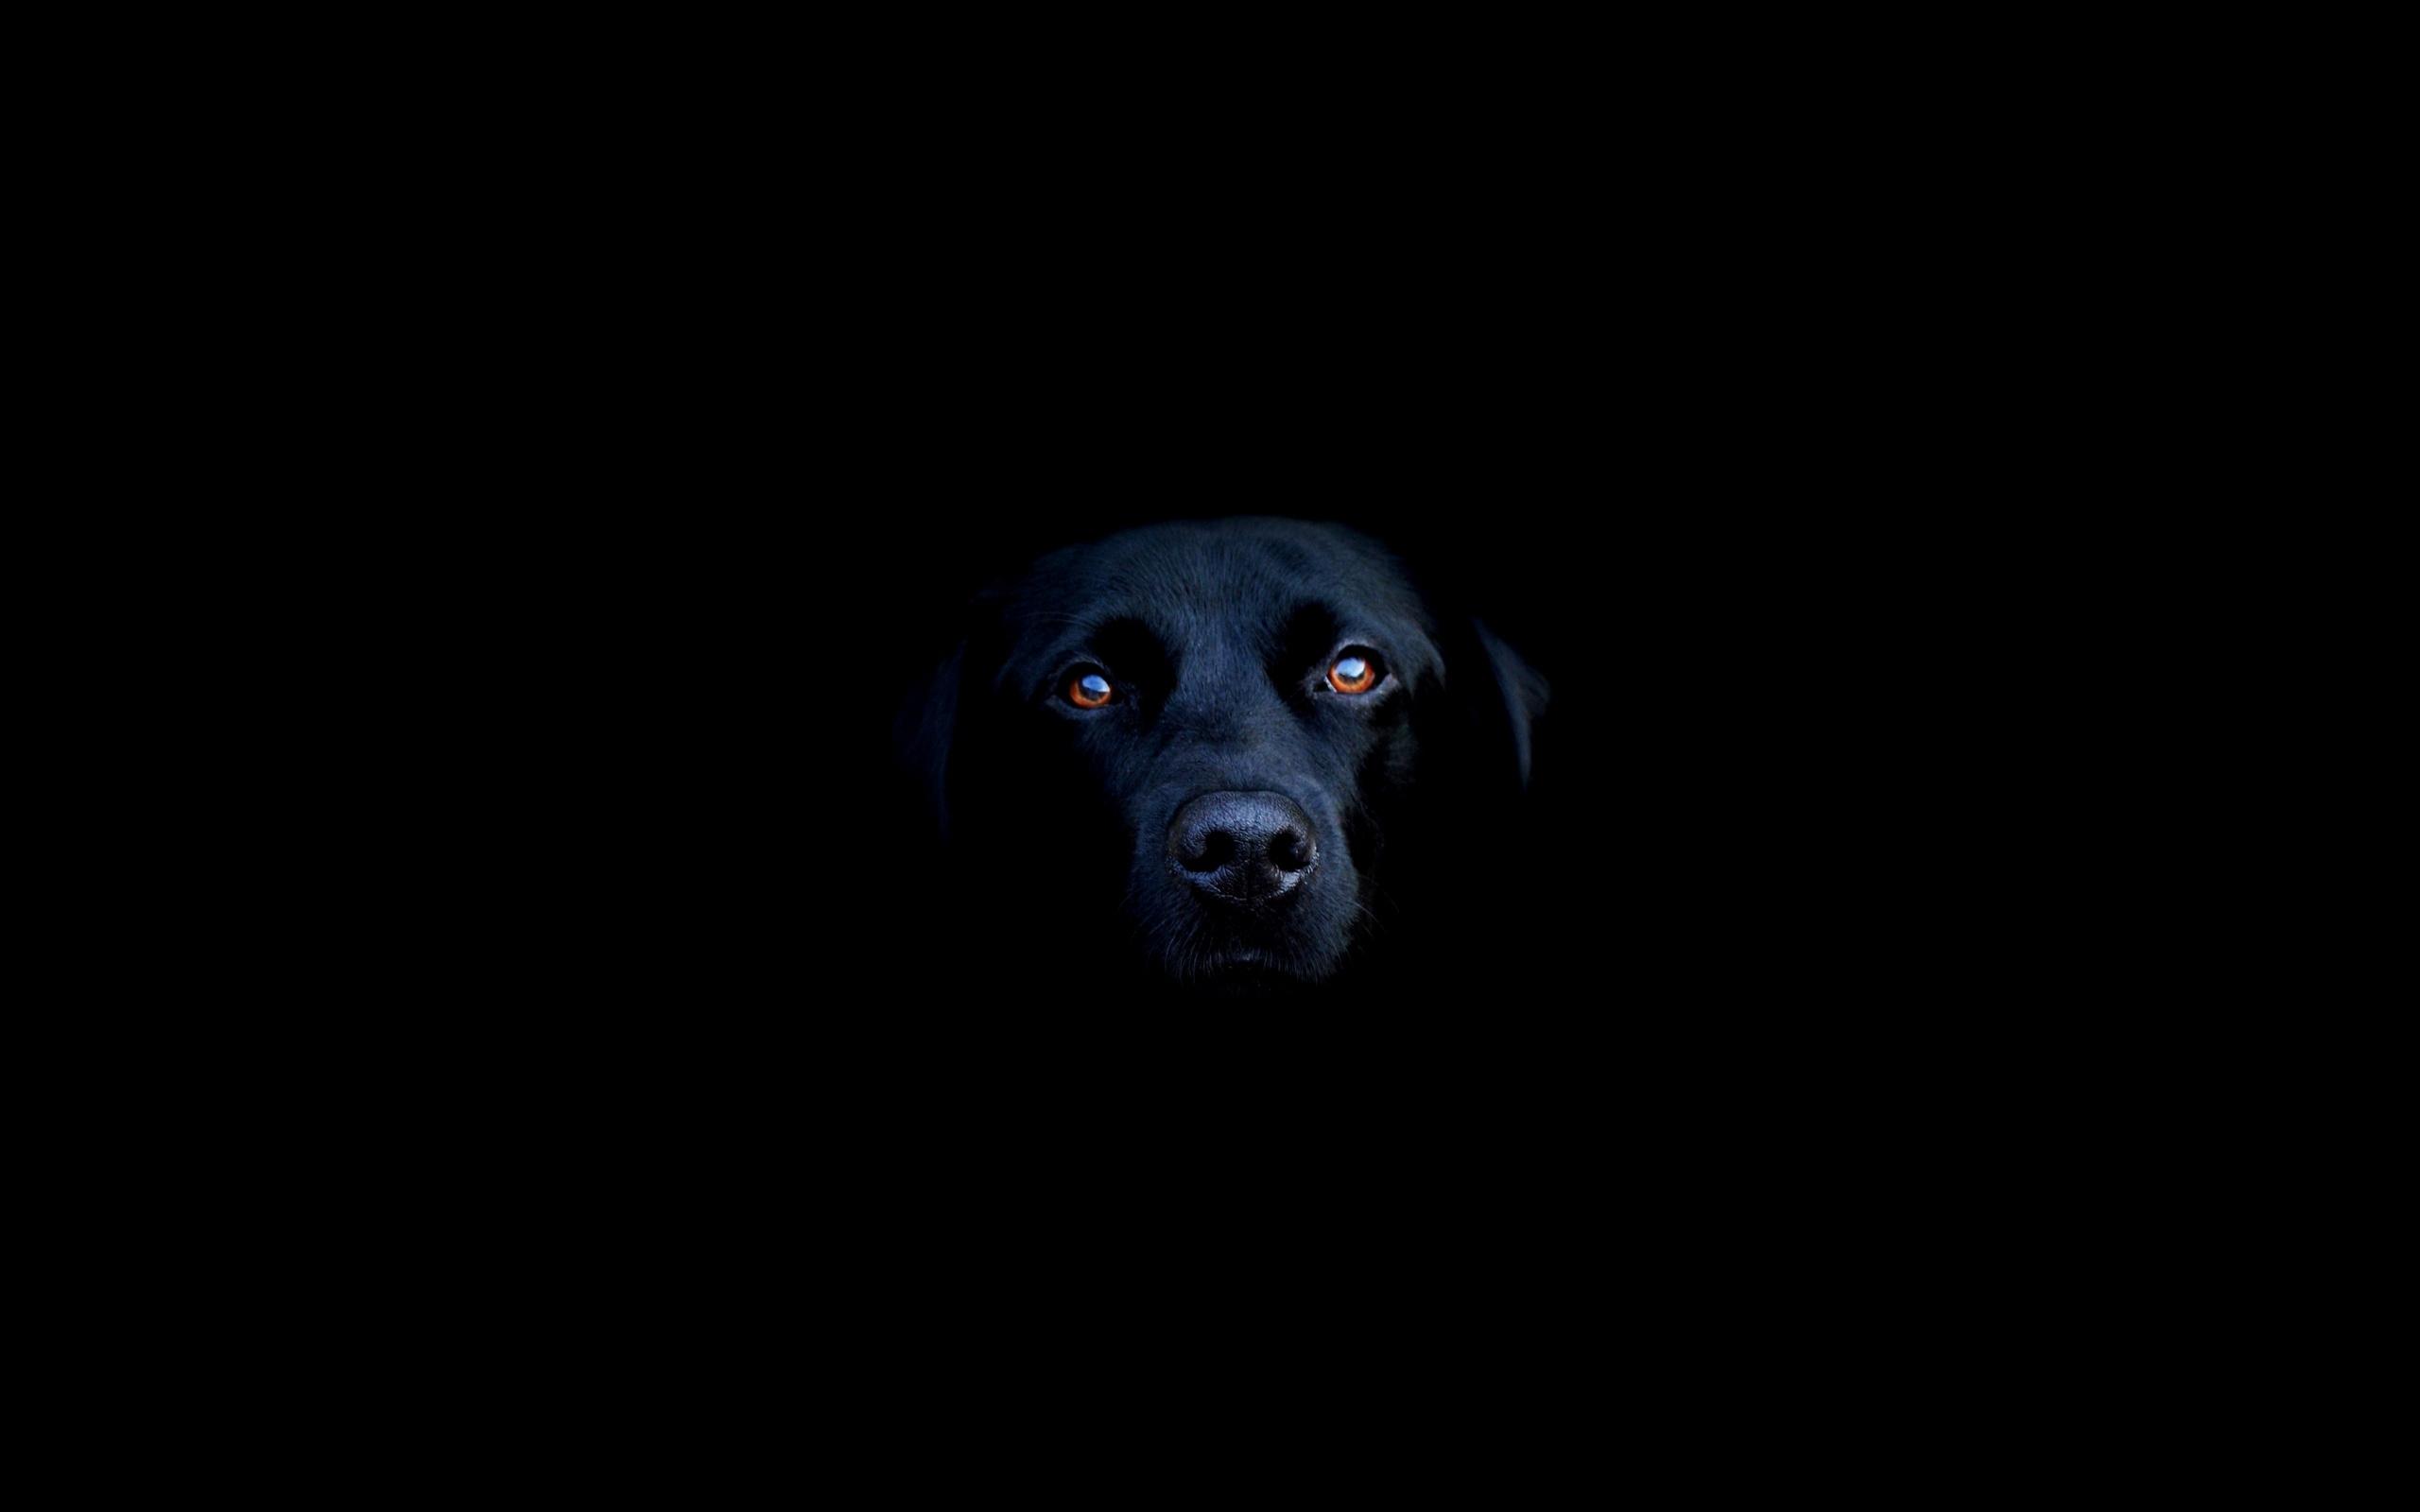 dog Mac Wallpaper Download Mac Wallpapers Download 2560x1600